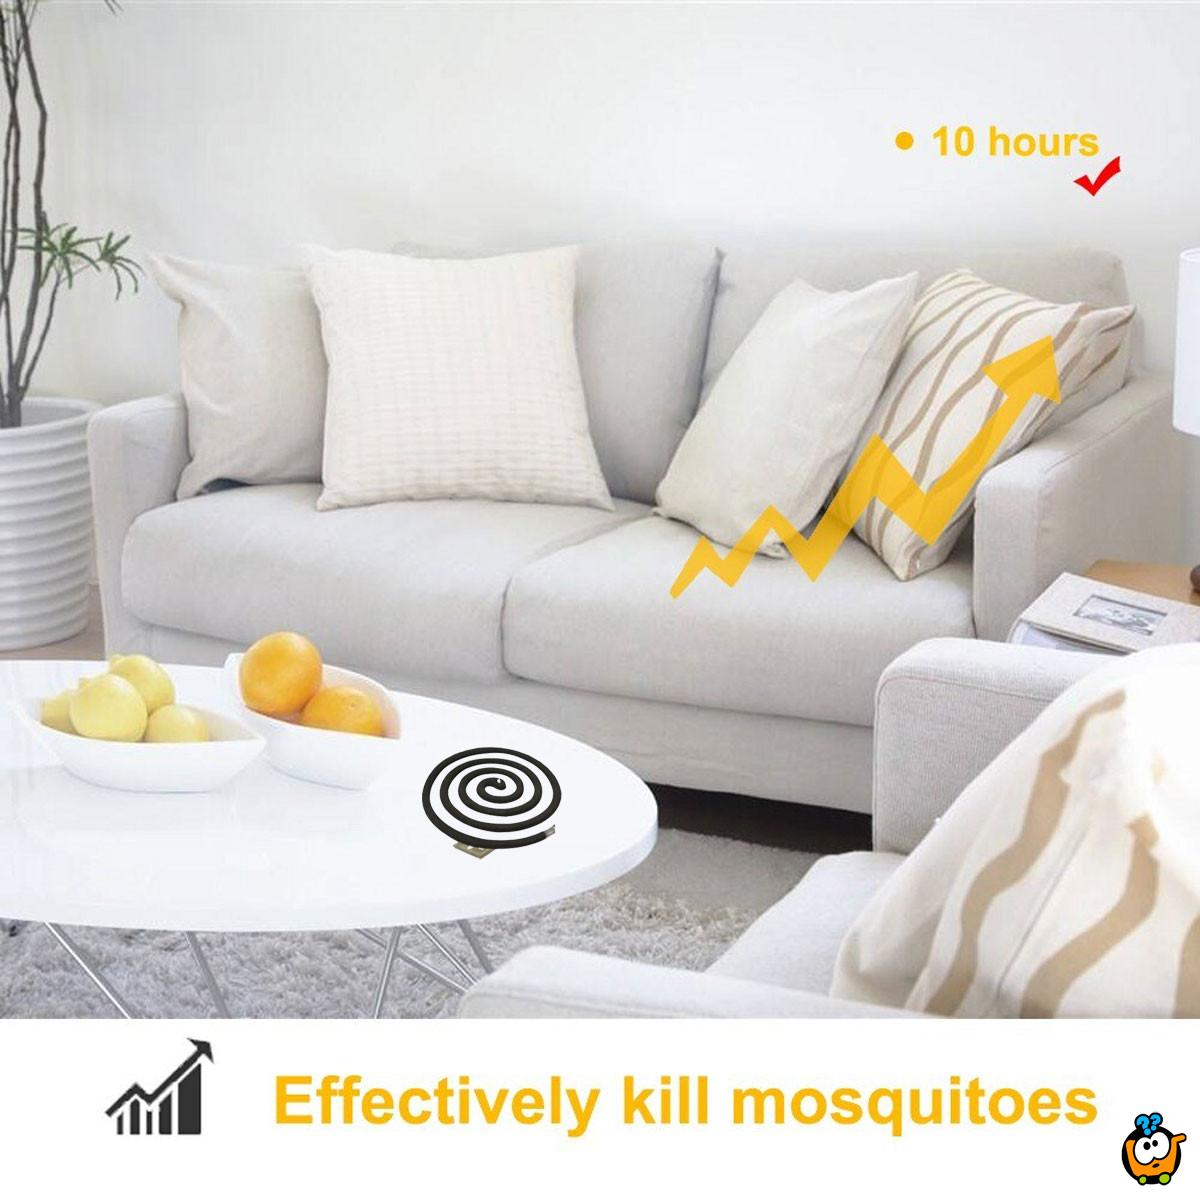 Spirala protiv komaraca